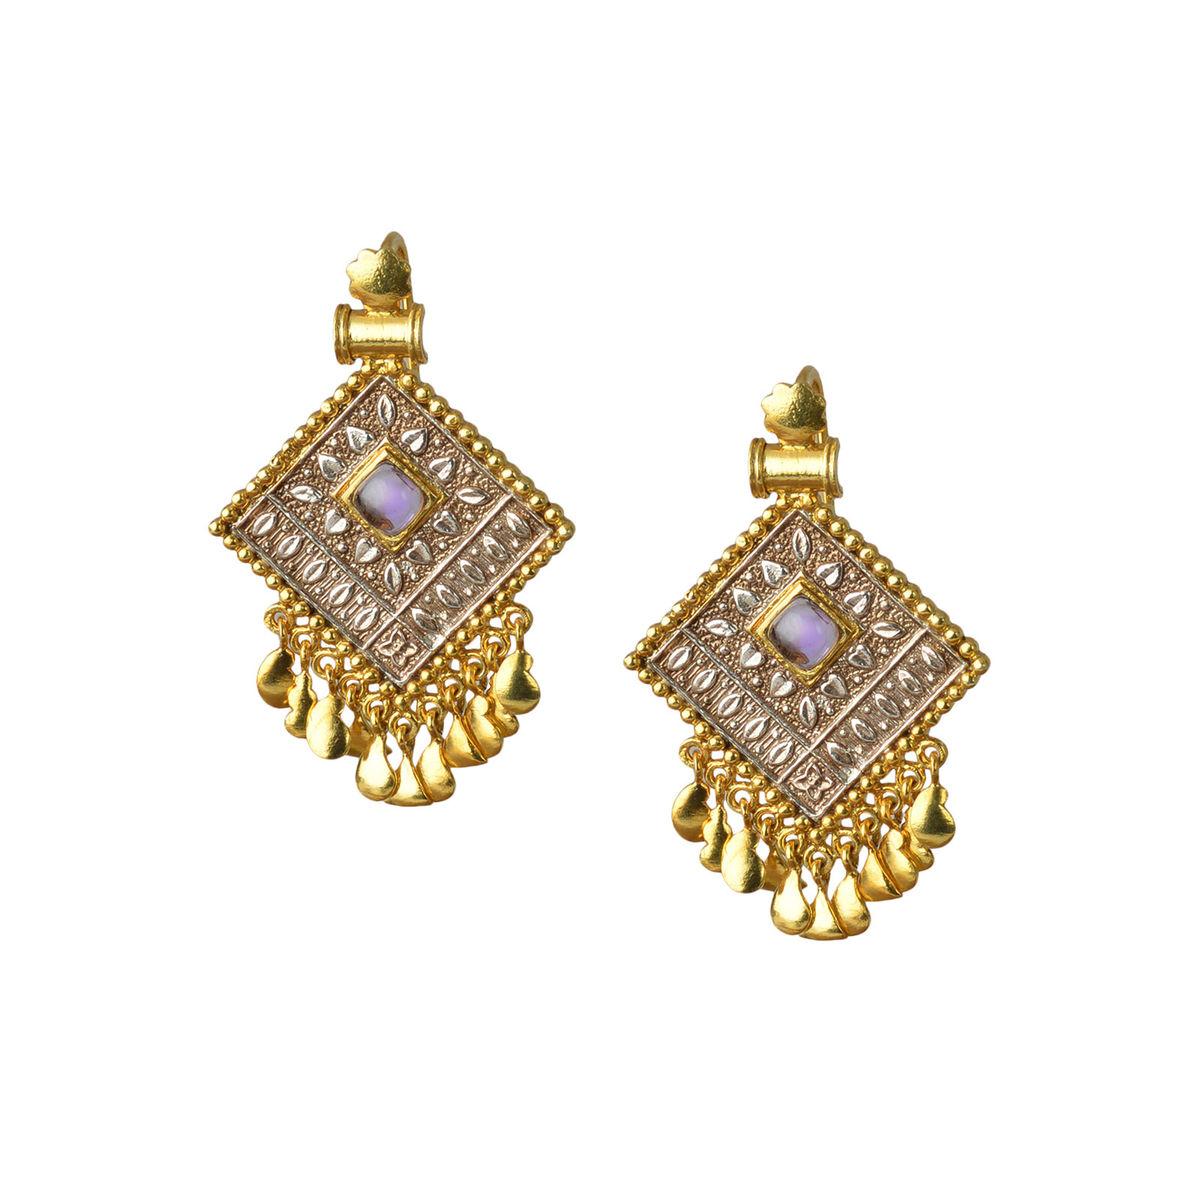 Engraved diamond shape  silver earrings